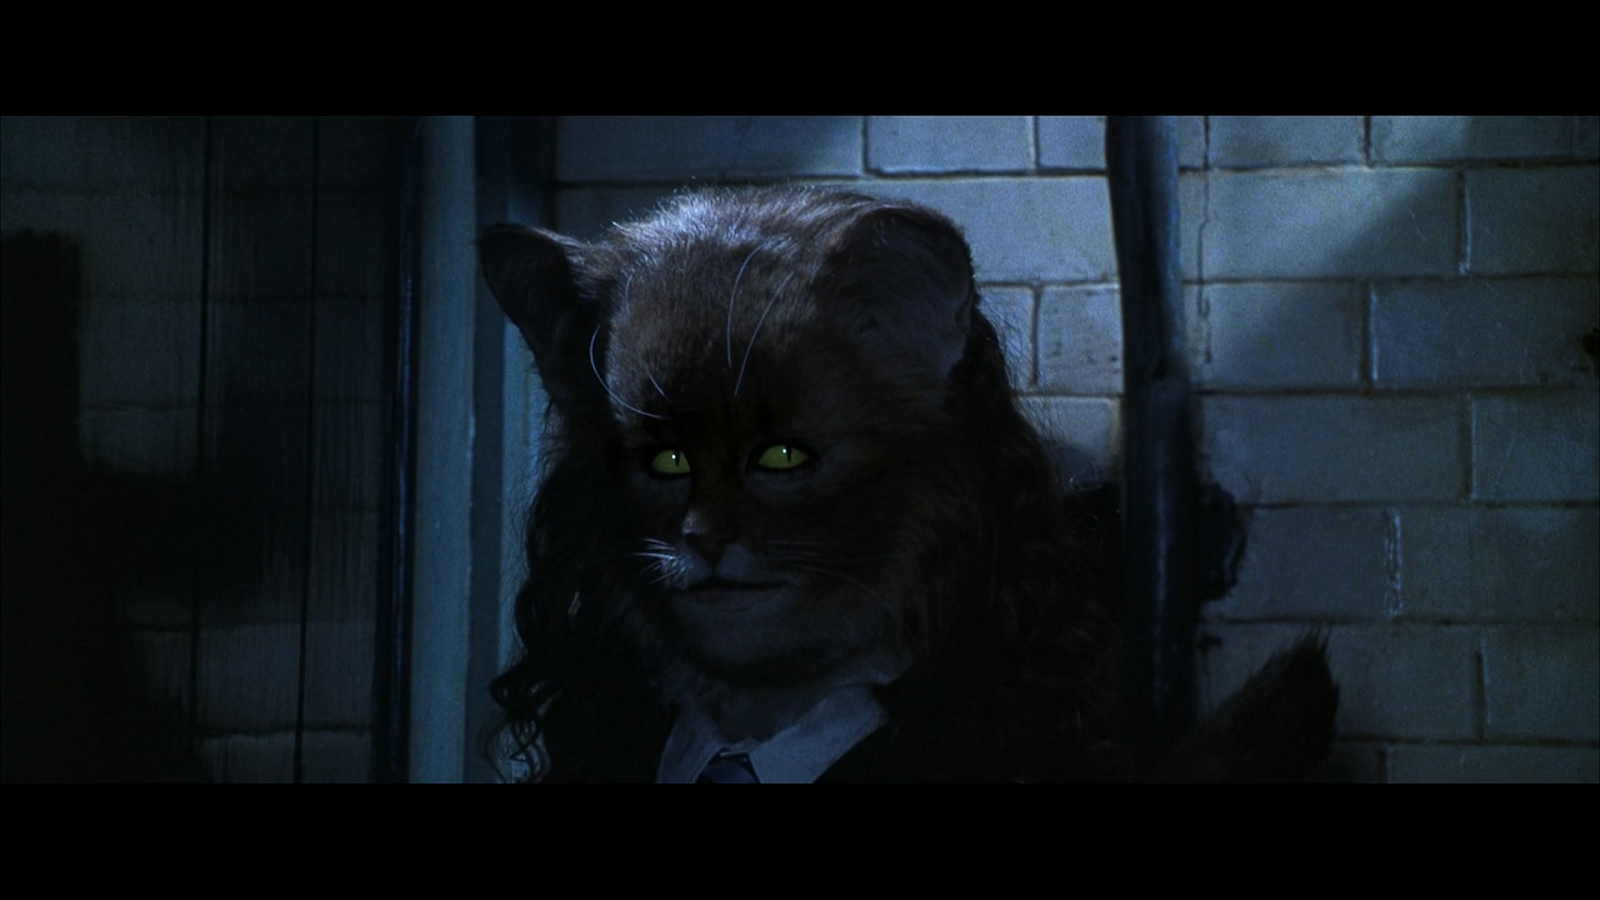 Harry Potter y la cámara secreta (2002) BRRip 720p Latino-Castellano-Ingles captura 3